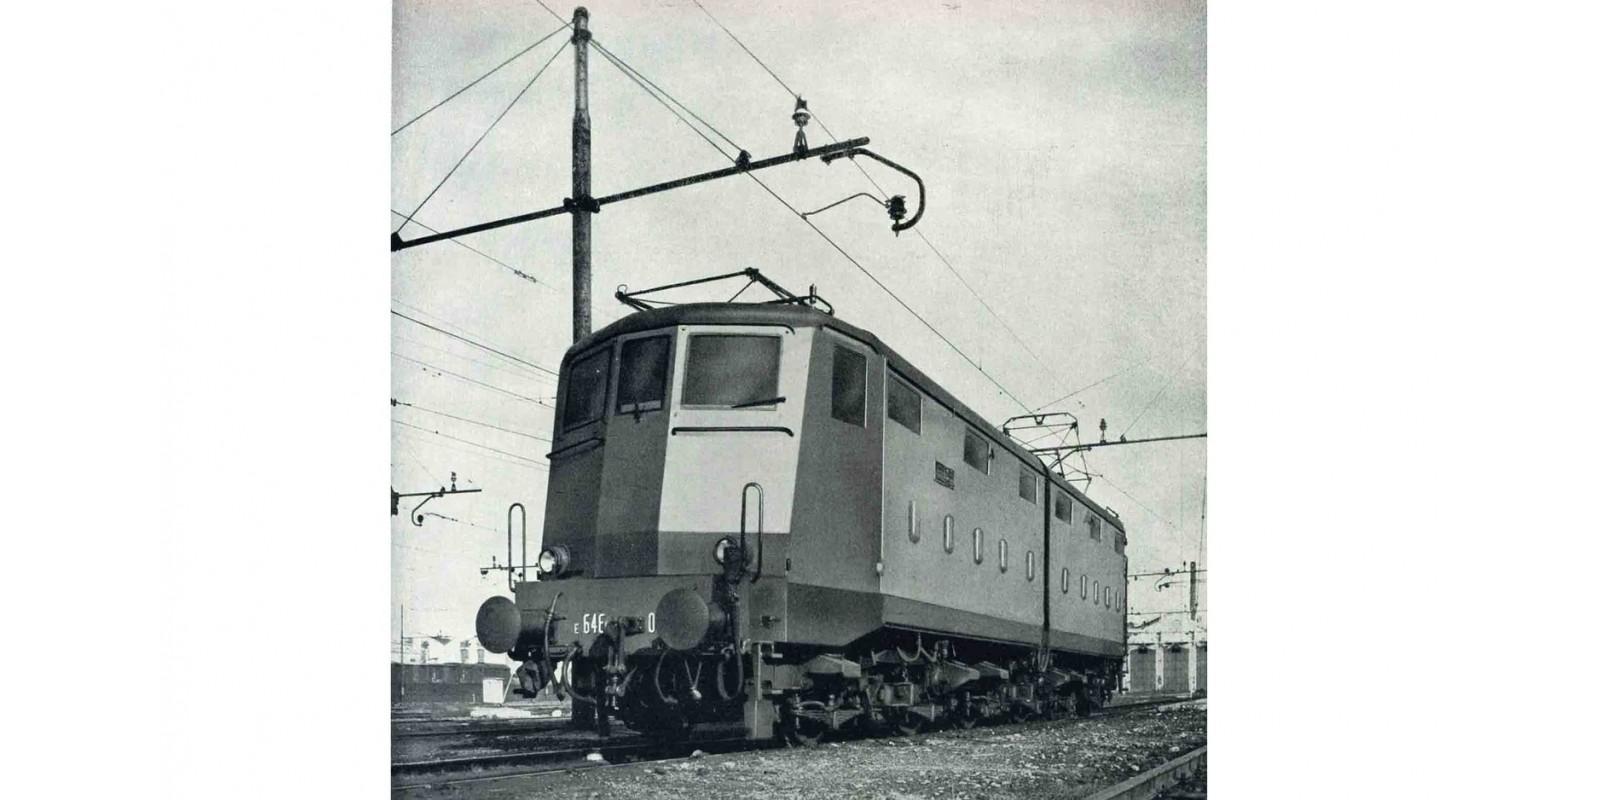 RI2739 FS, electric locomotive E 646 033 first series, castano / isabella livery, pantographs type 42U, period III-IV